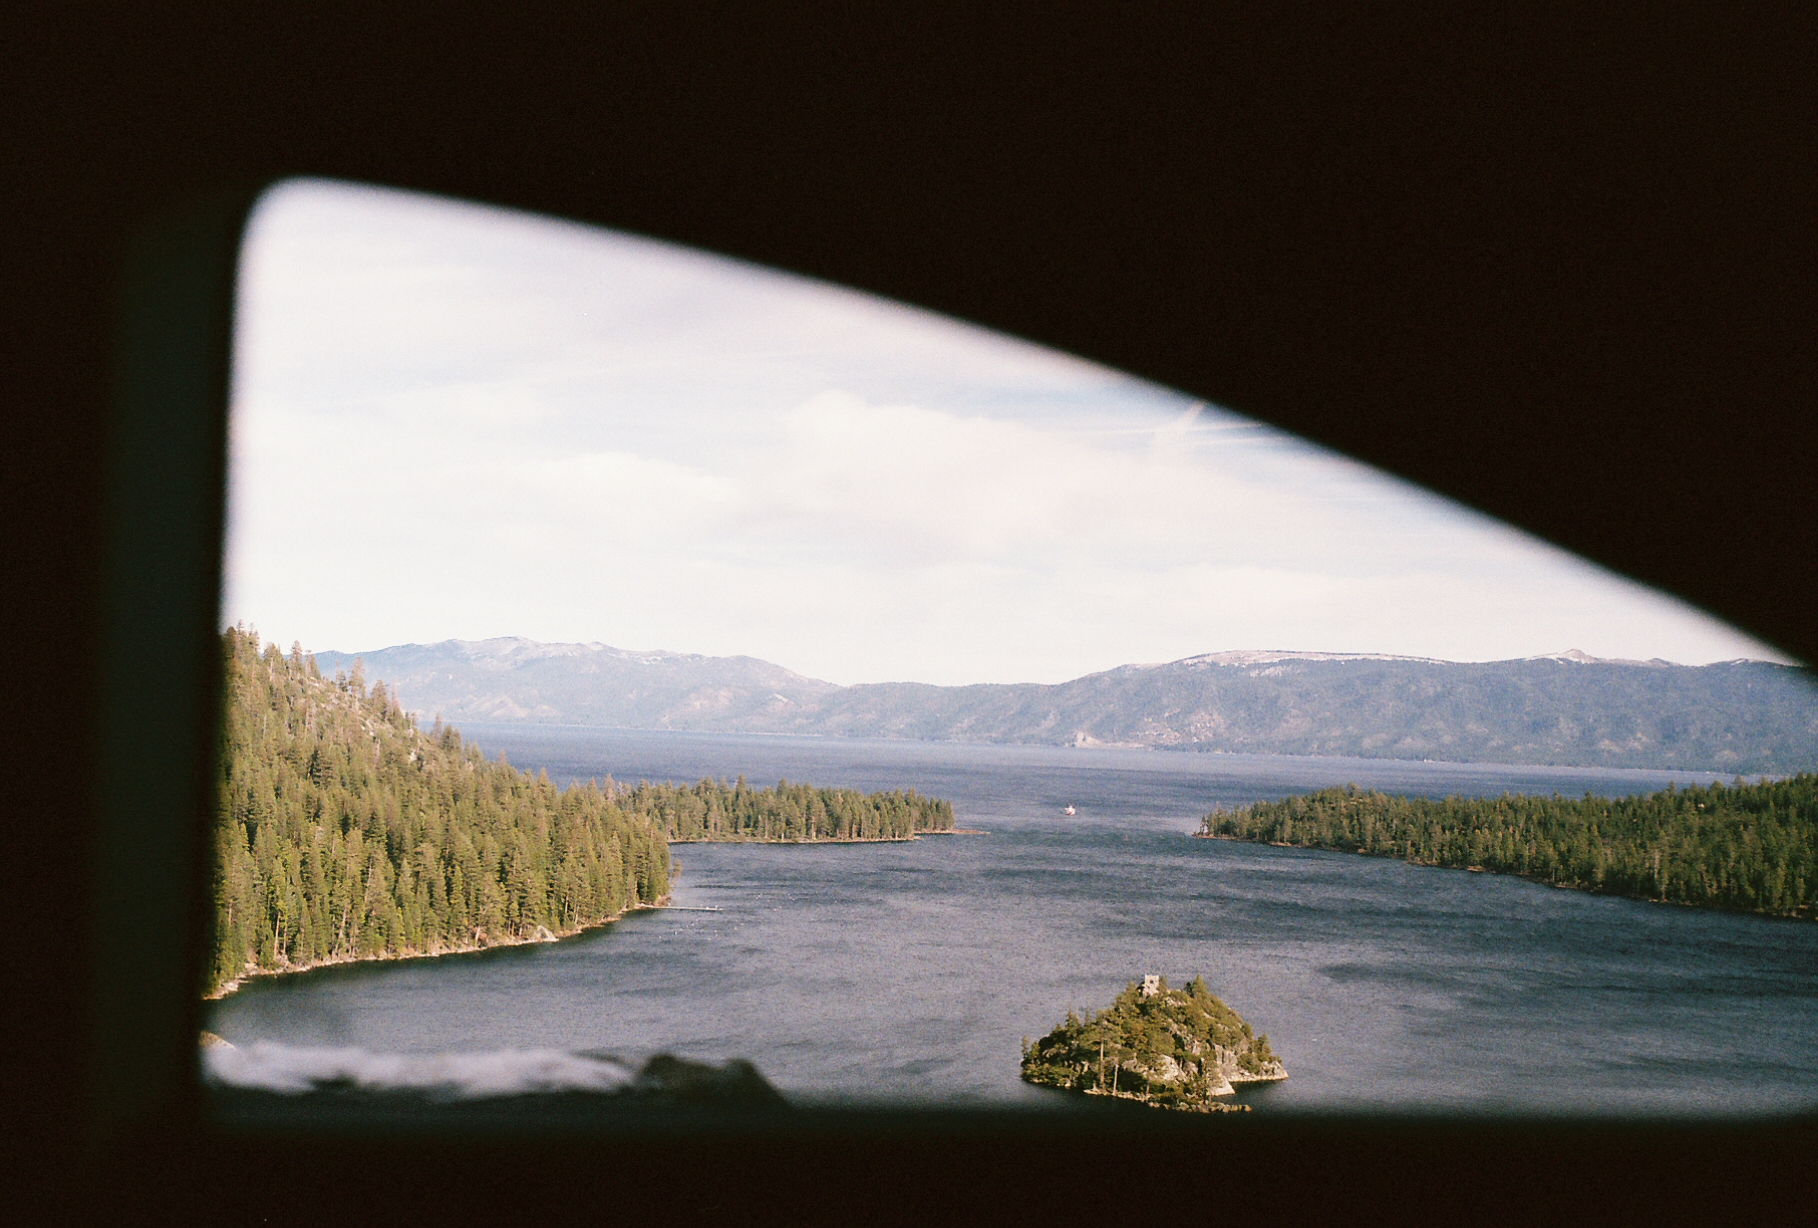 South_Lake_Tahoe_cristofer_Jeschke.jpg